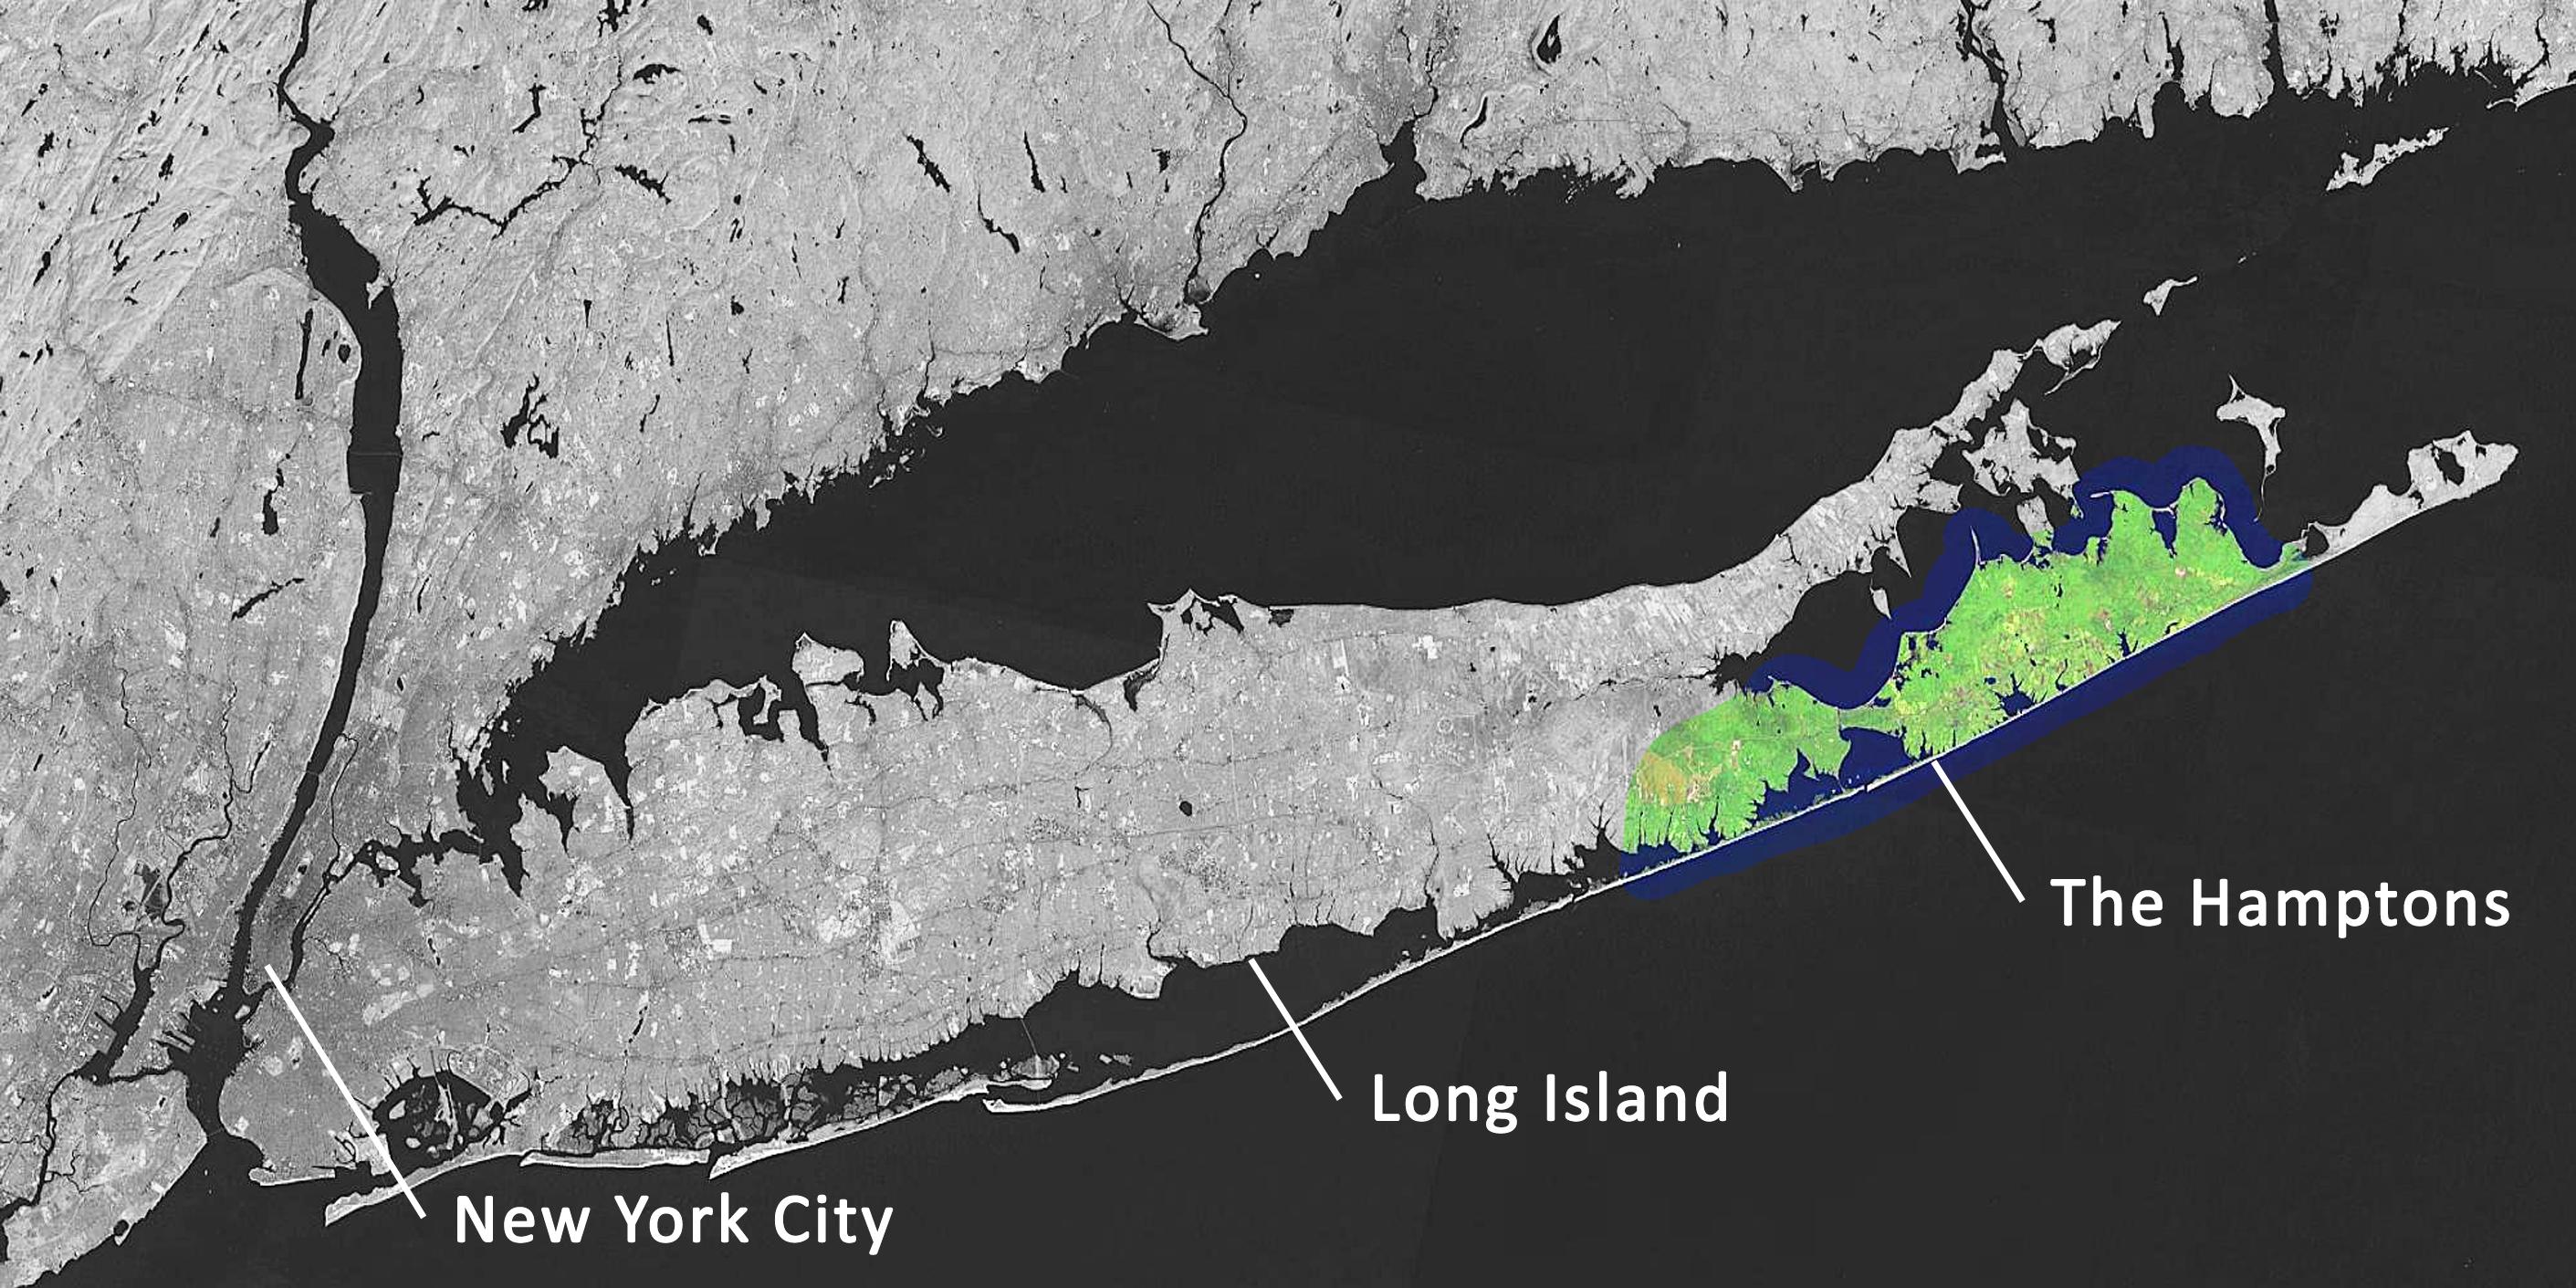 The hamptons wikiwand for Hamptons long island